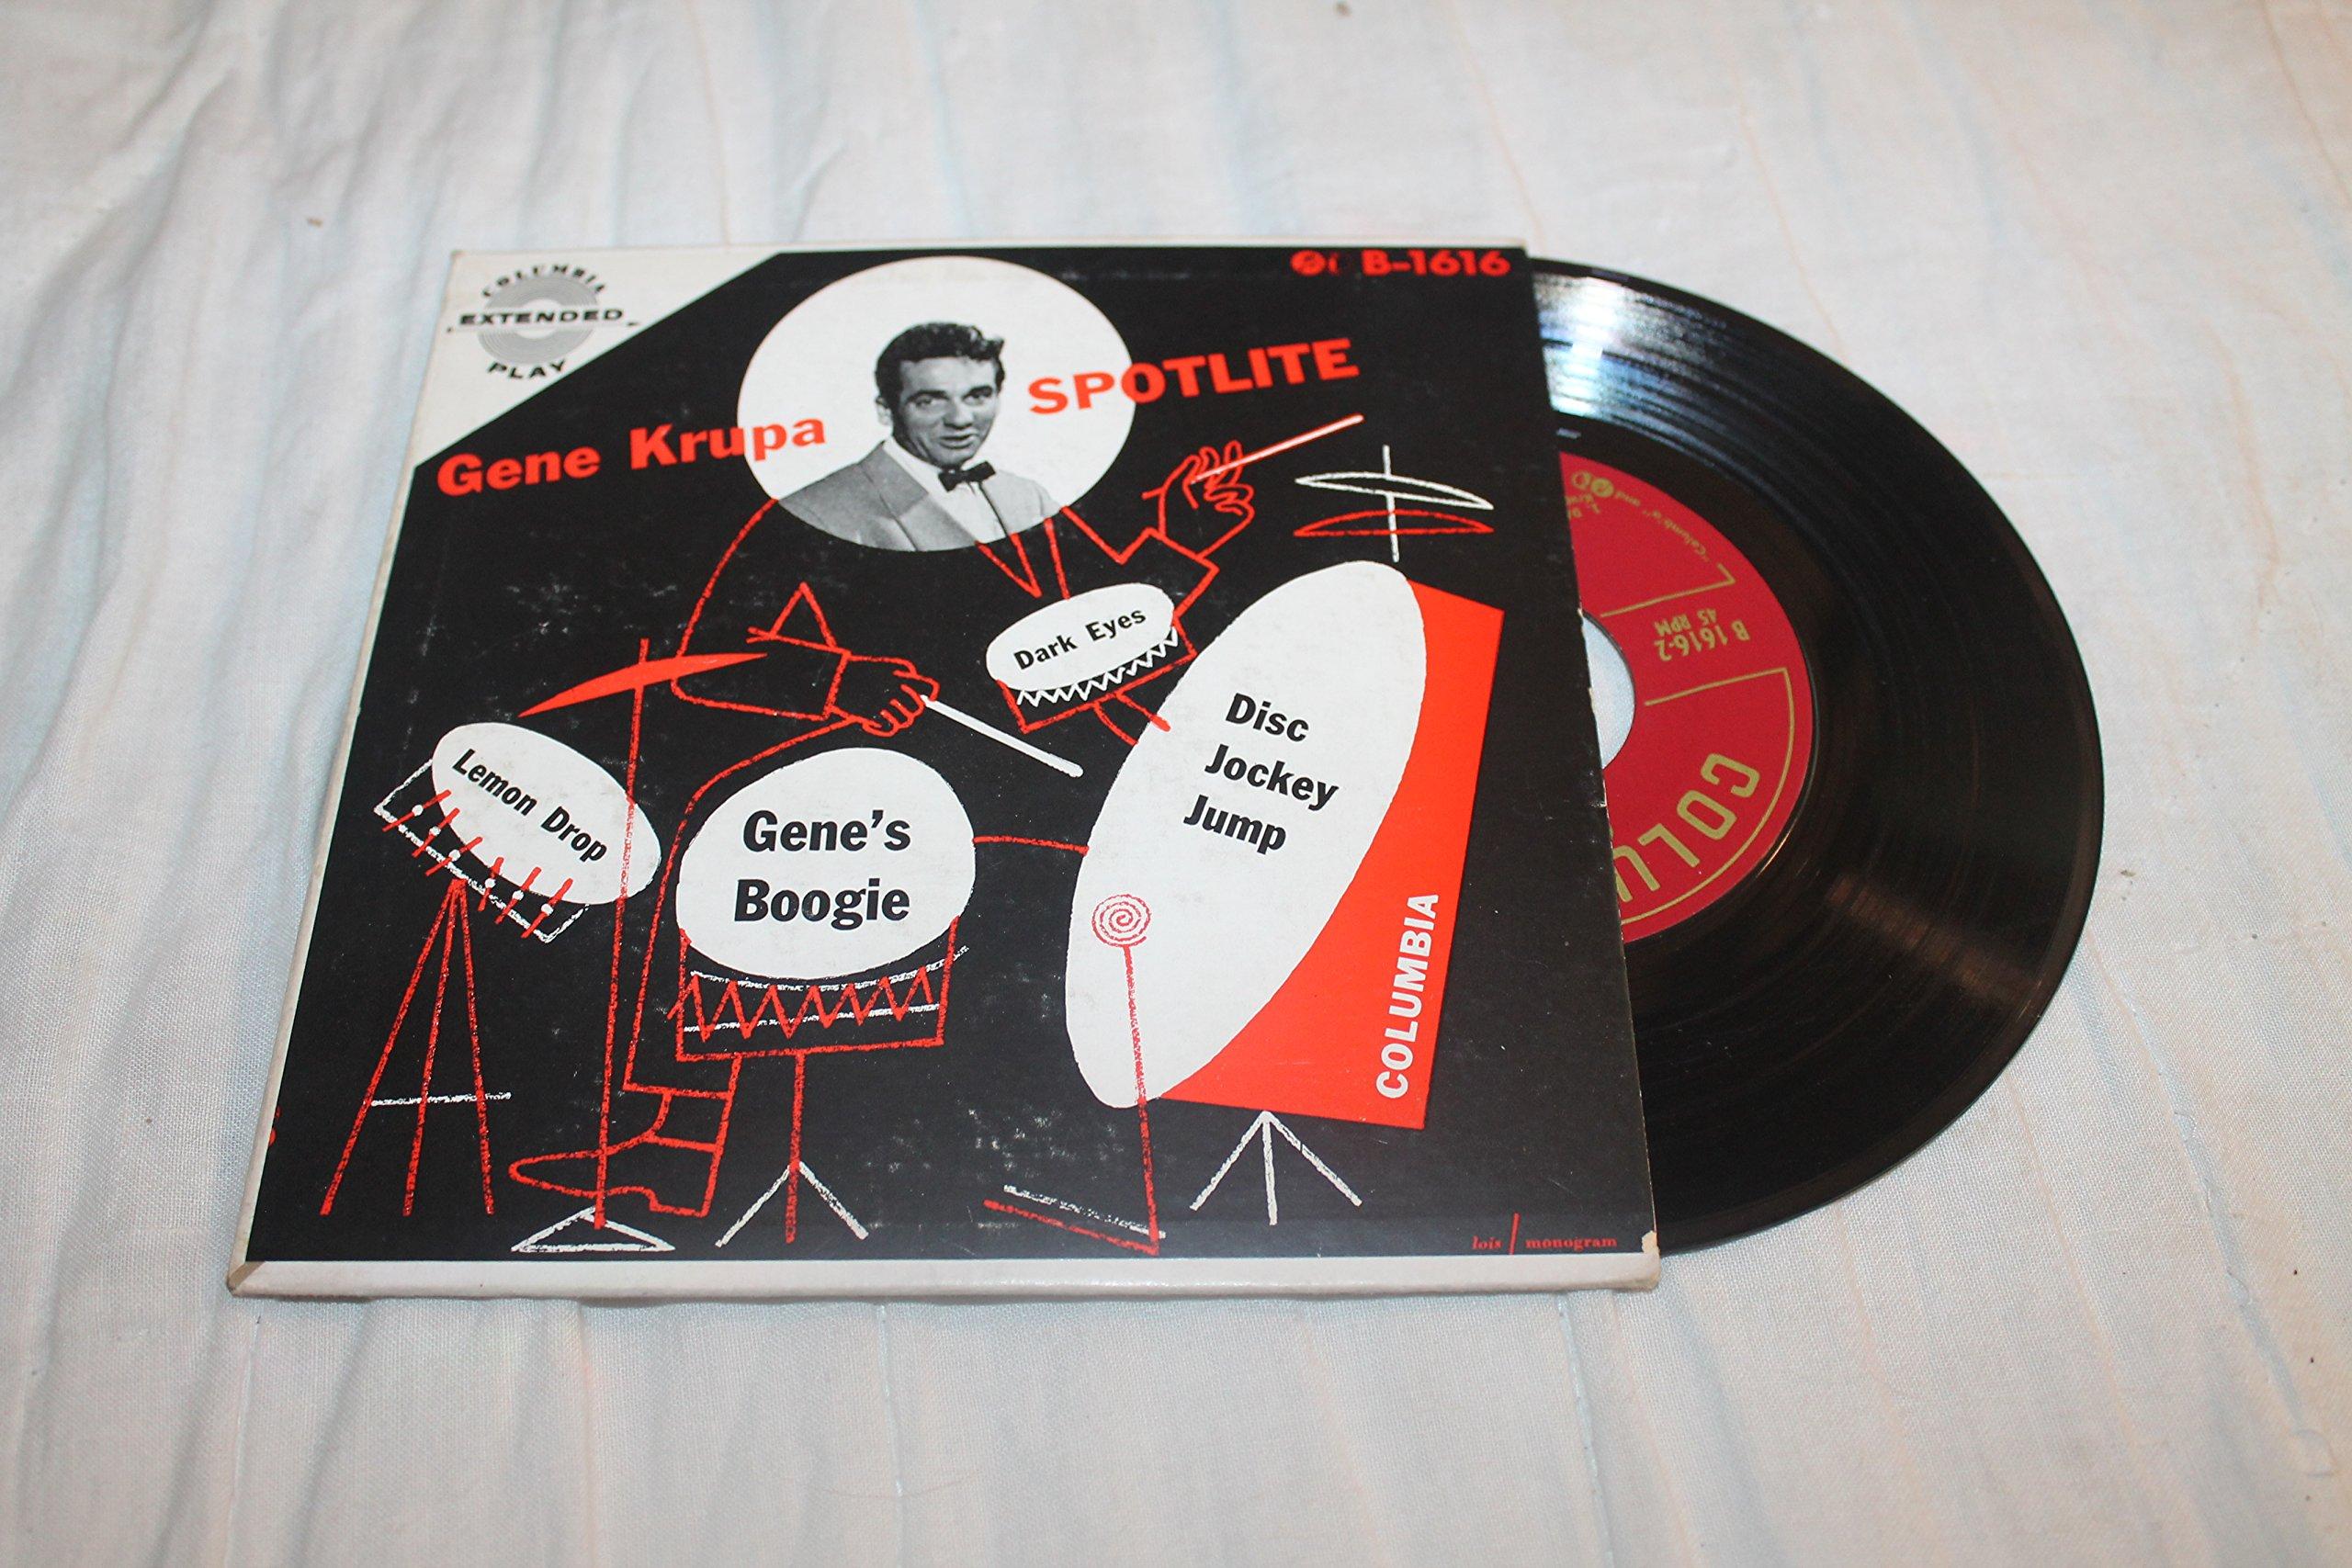 Gene Krupa Spotlite